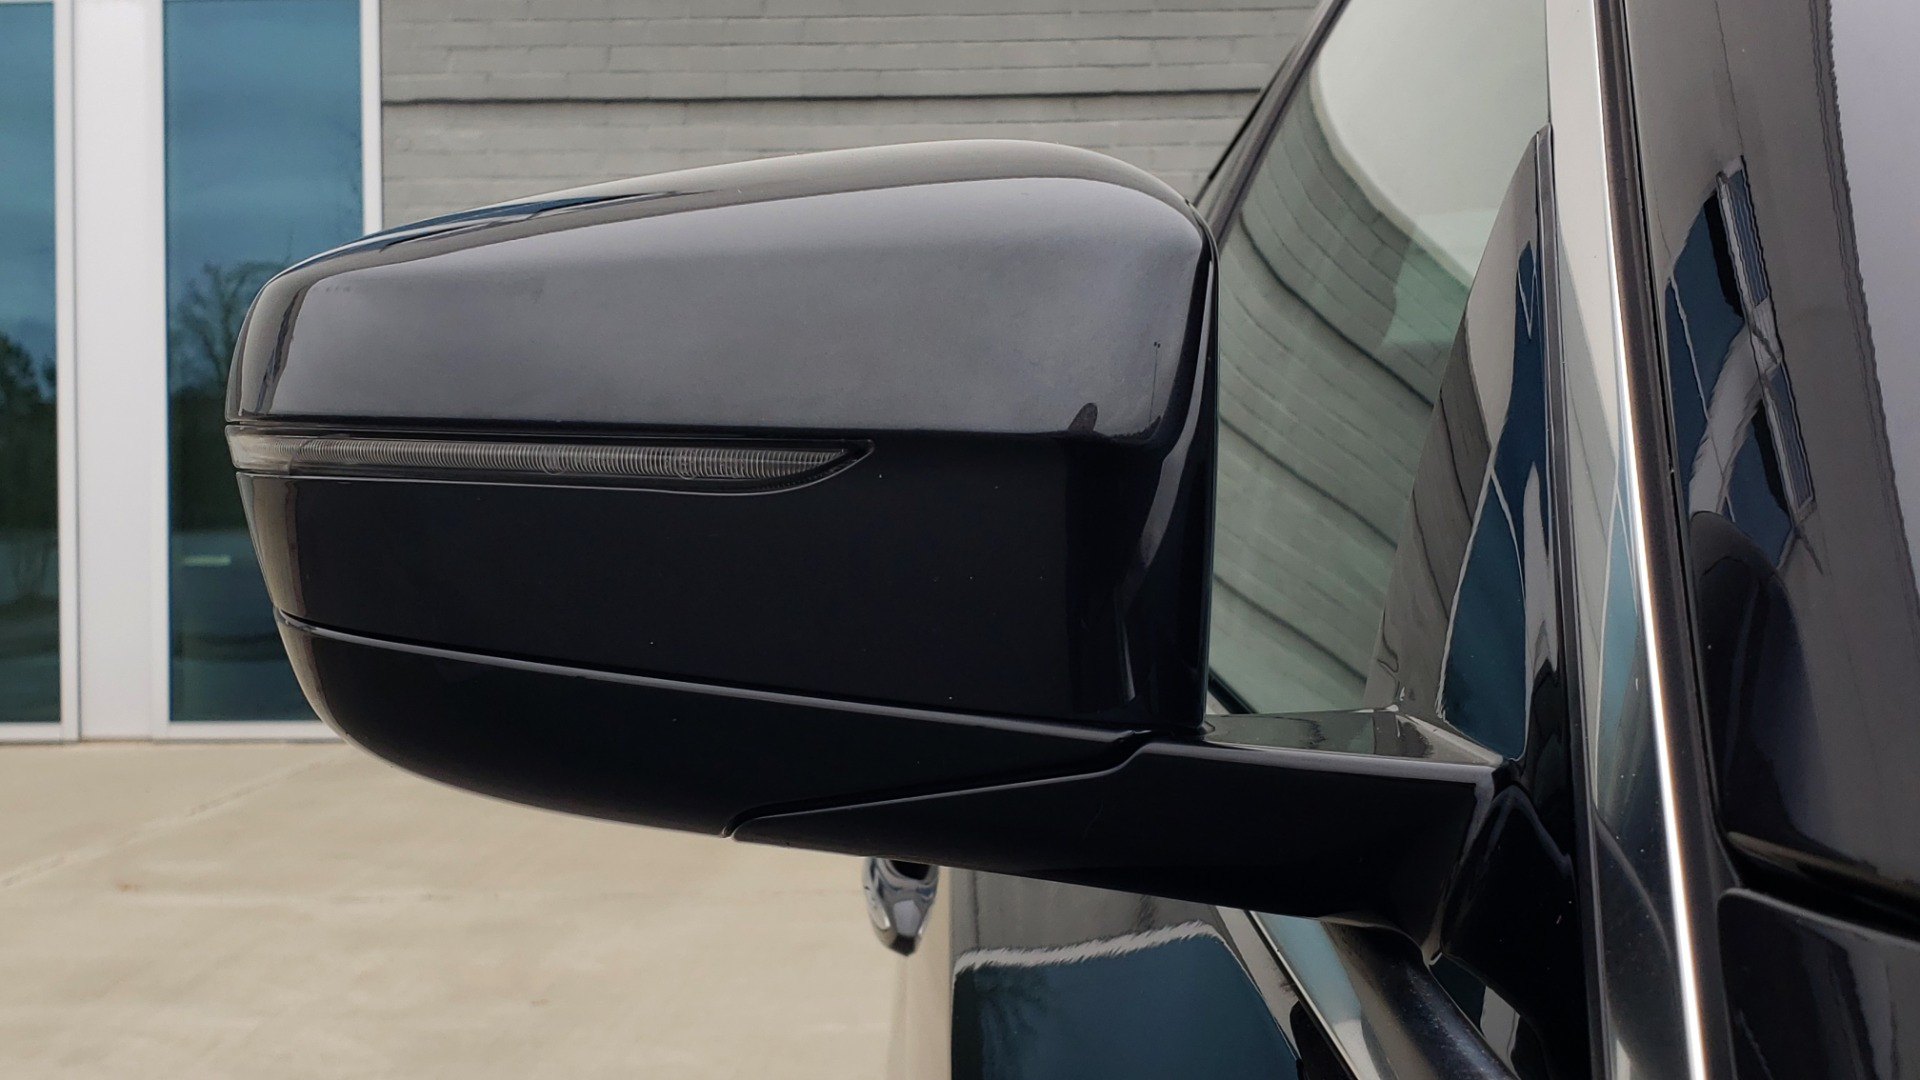 Used 2017 BMW 5 SERIES 530IXDRIVE / PREM PKG / DRVR ASST PLUS / CLD WTHR / APPLE CARPLAY for sale $30,595 at Formula Imports in Charlotte NC 28227 23